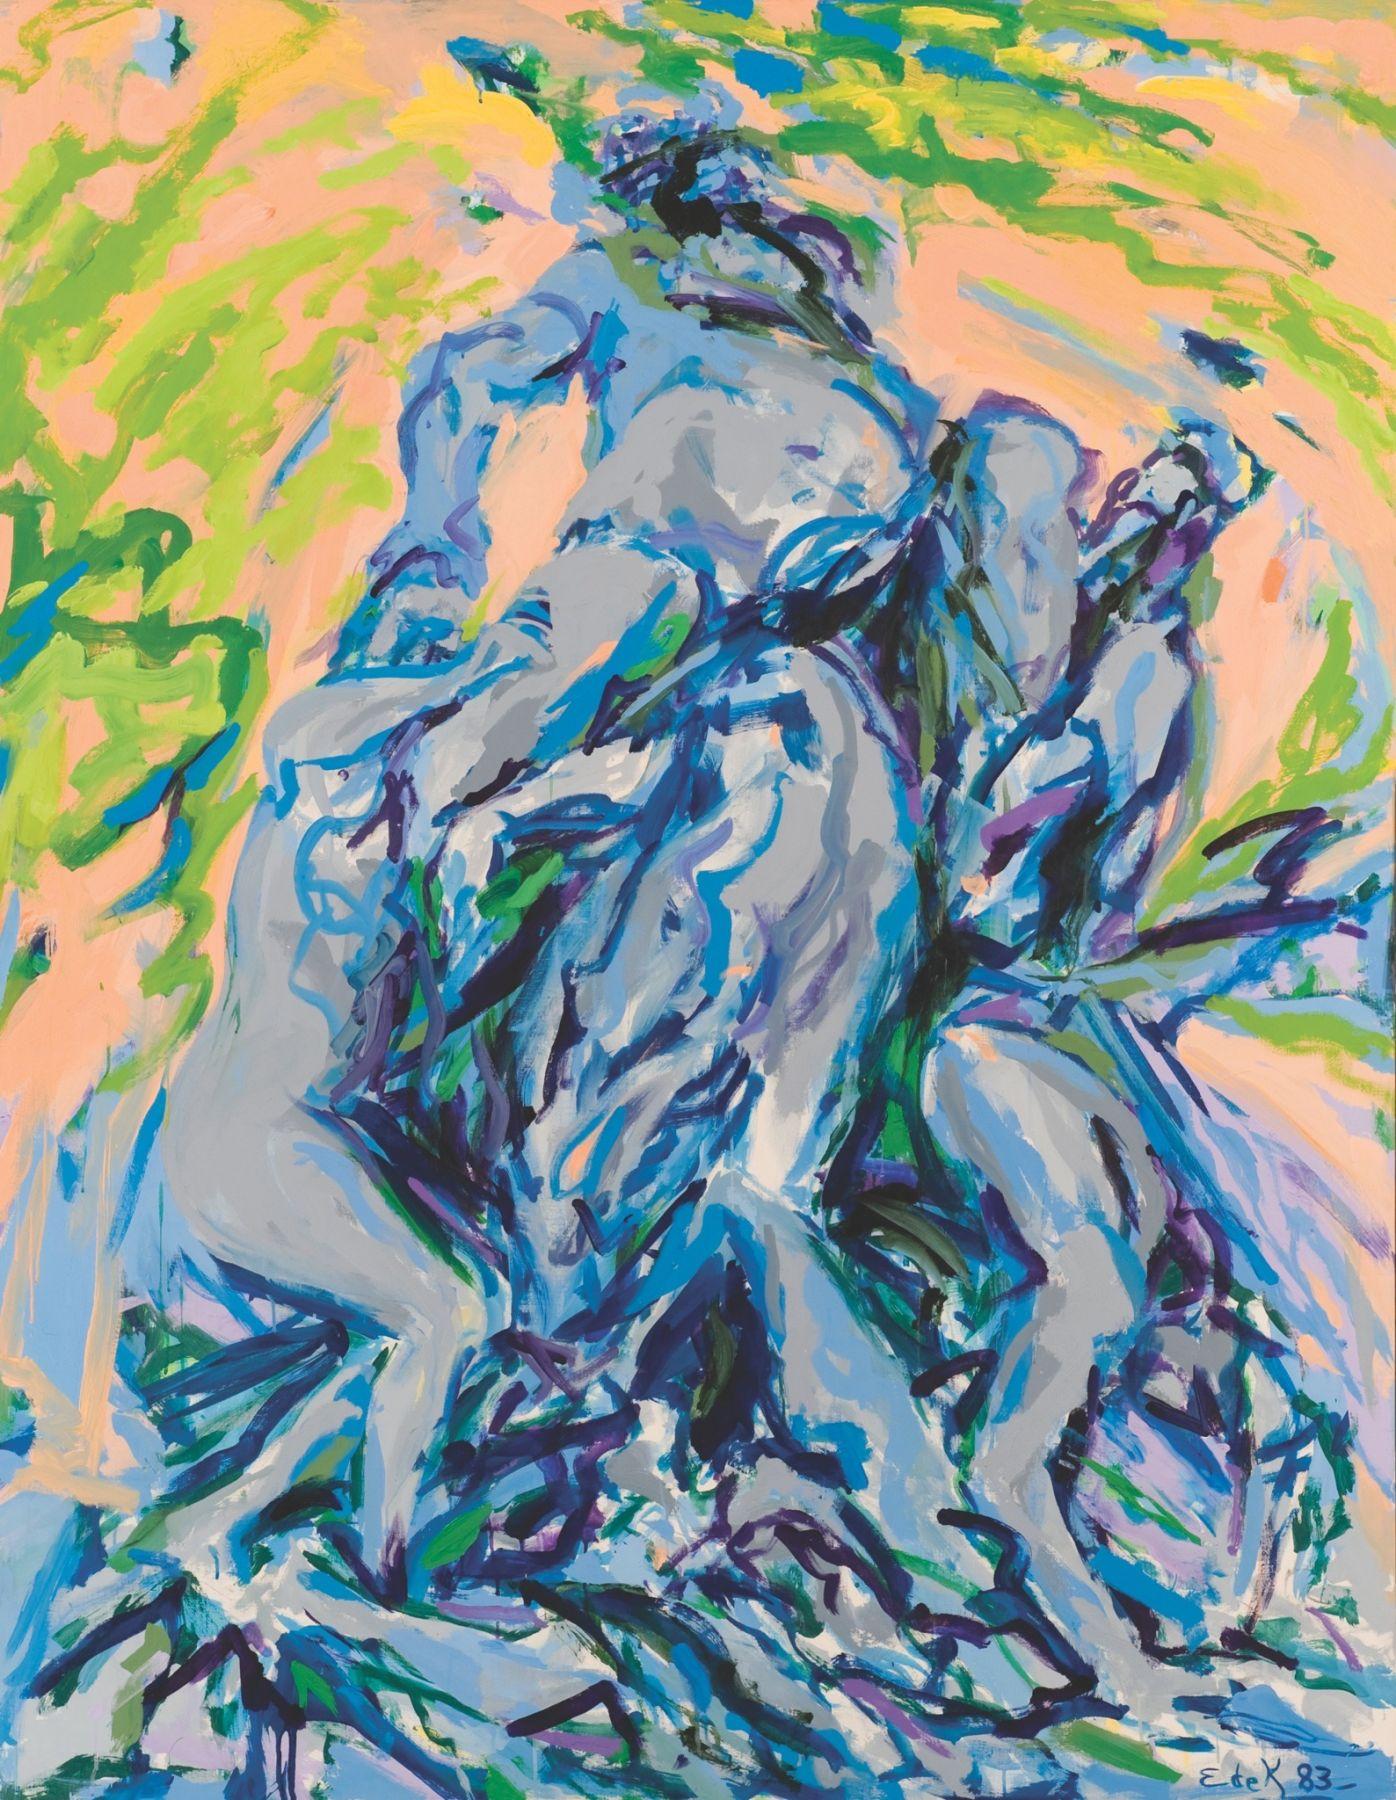 Elaine de Kooning, Bacchus #80